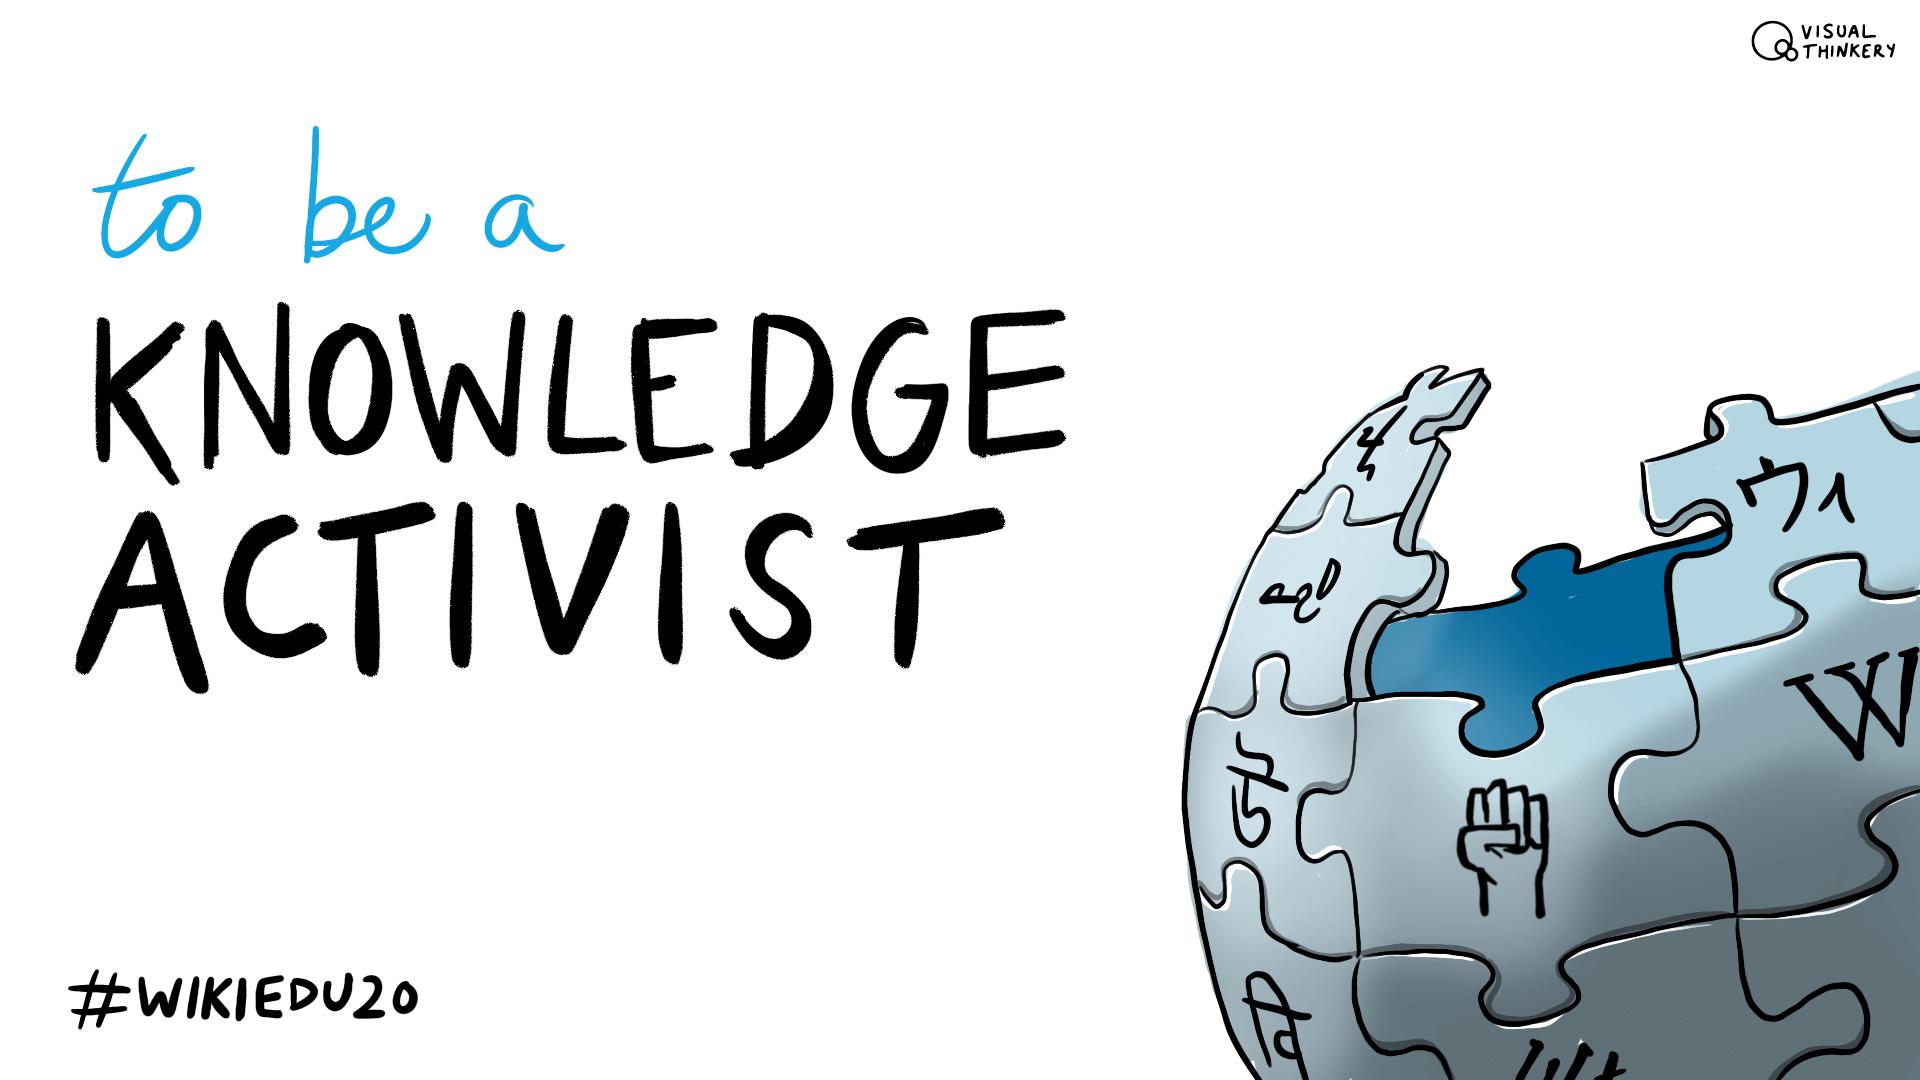 Knowledge activist